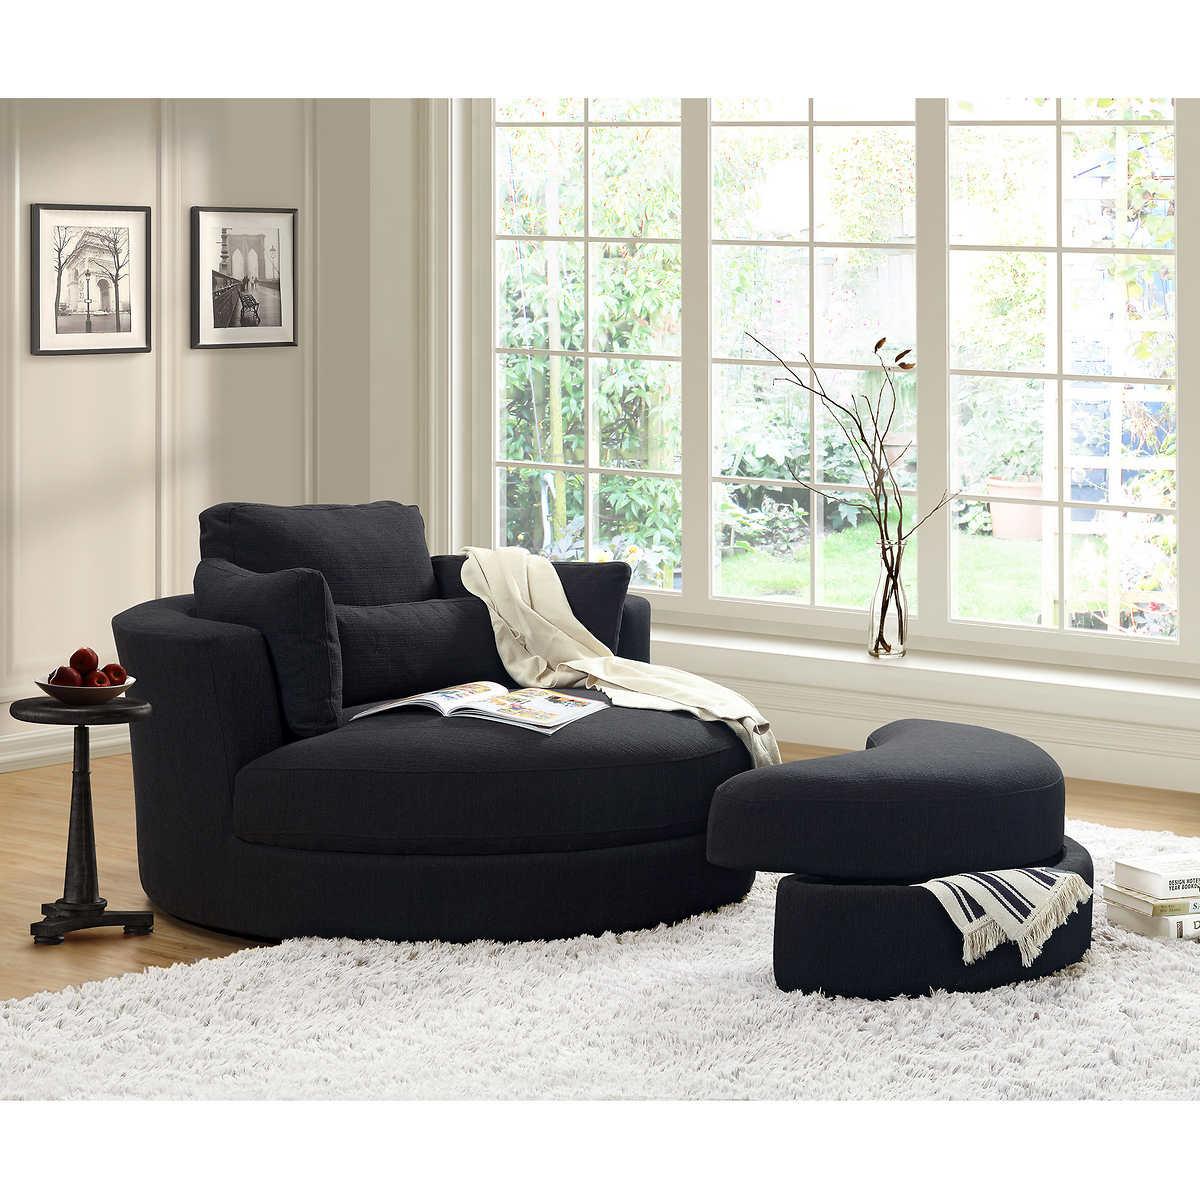 Furniture swivel and tub chairs dori fabric swivel cuddle chair - Turner Black Cuddler Swivel Chair With Storage Ottoman